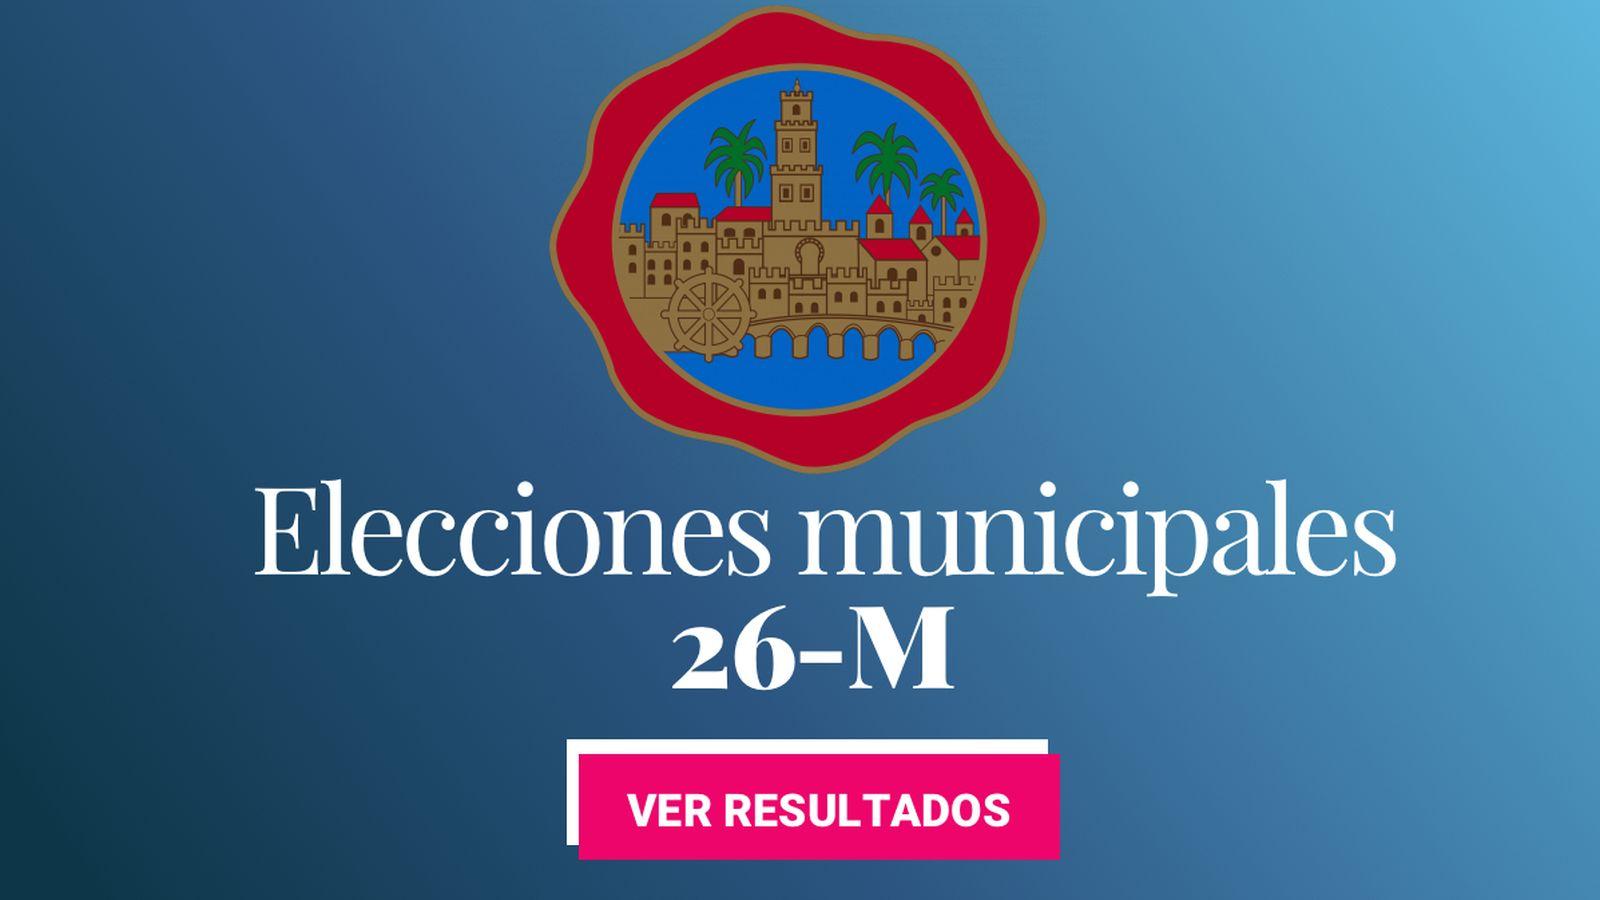 Foto: Elecciones municipales 2019 en Córdoba. (C.C./EC)